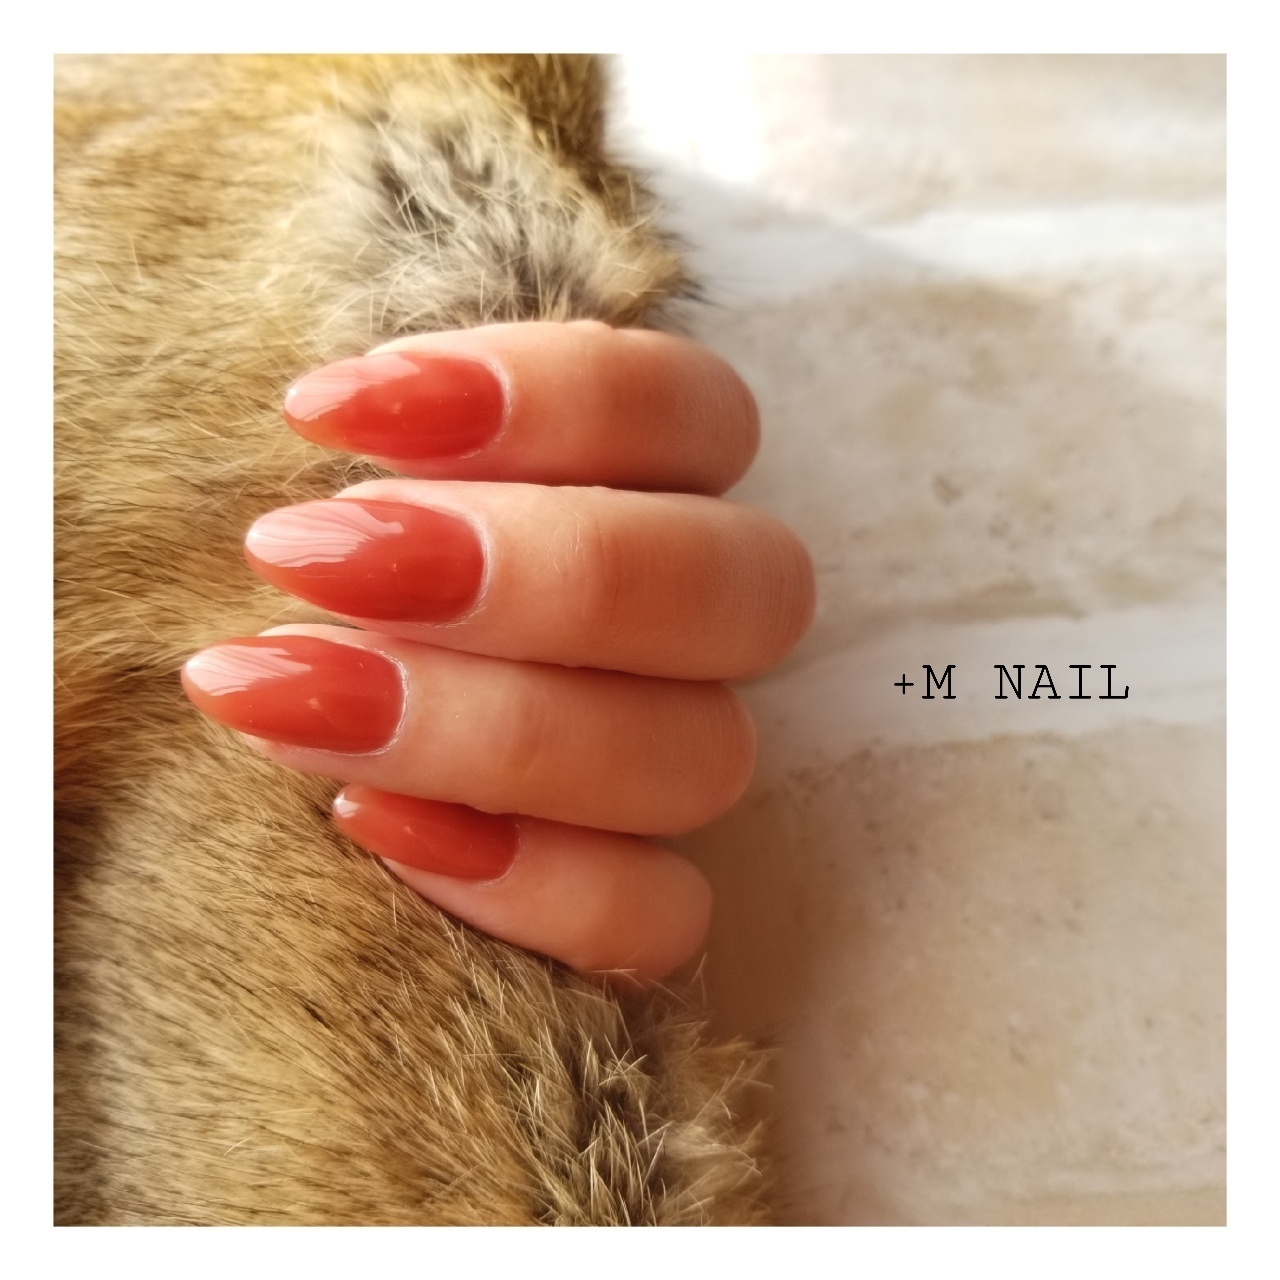 #nails #ジェル #ジェルネイル #ネイル #ネイルサロン #ネイルデザイン #ハンド #大人ネイル #大人可愛い #ワンカラーネイル#シンプルネイル